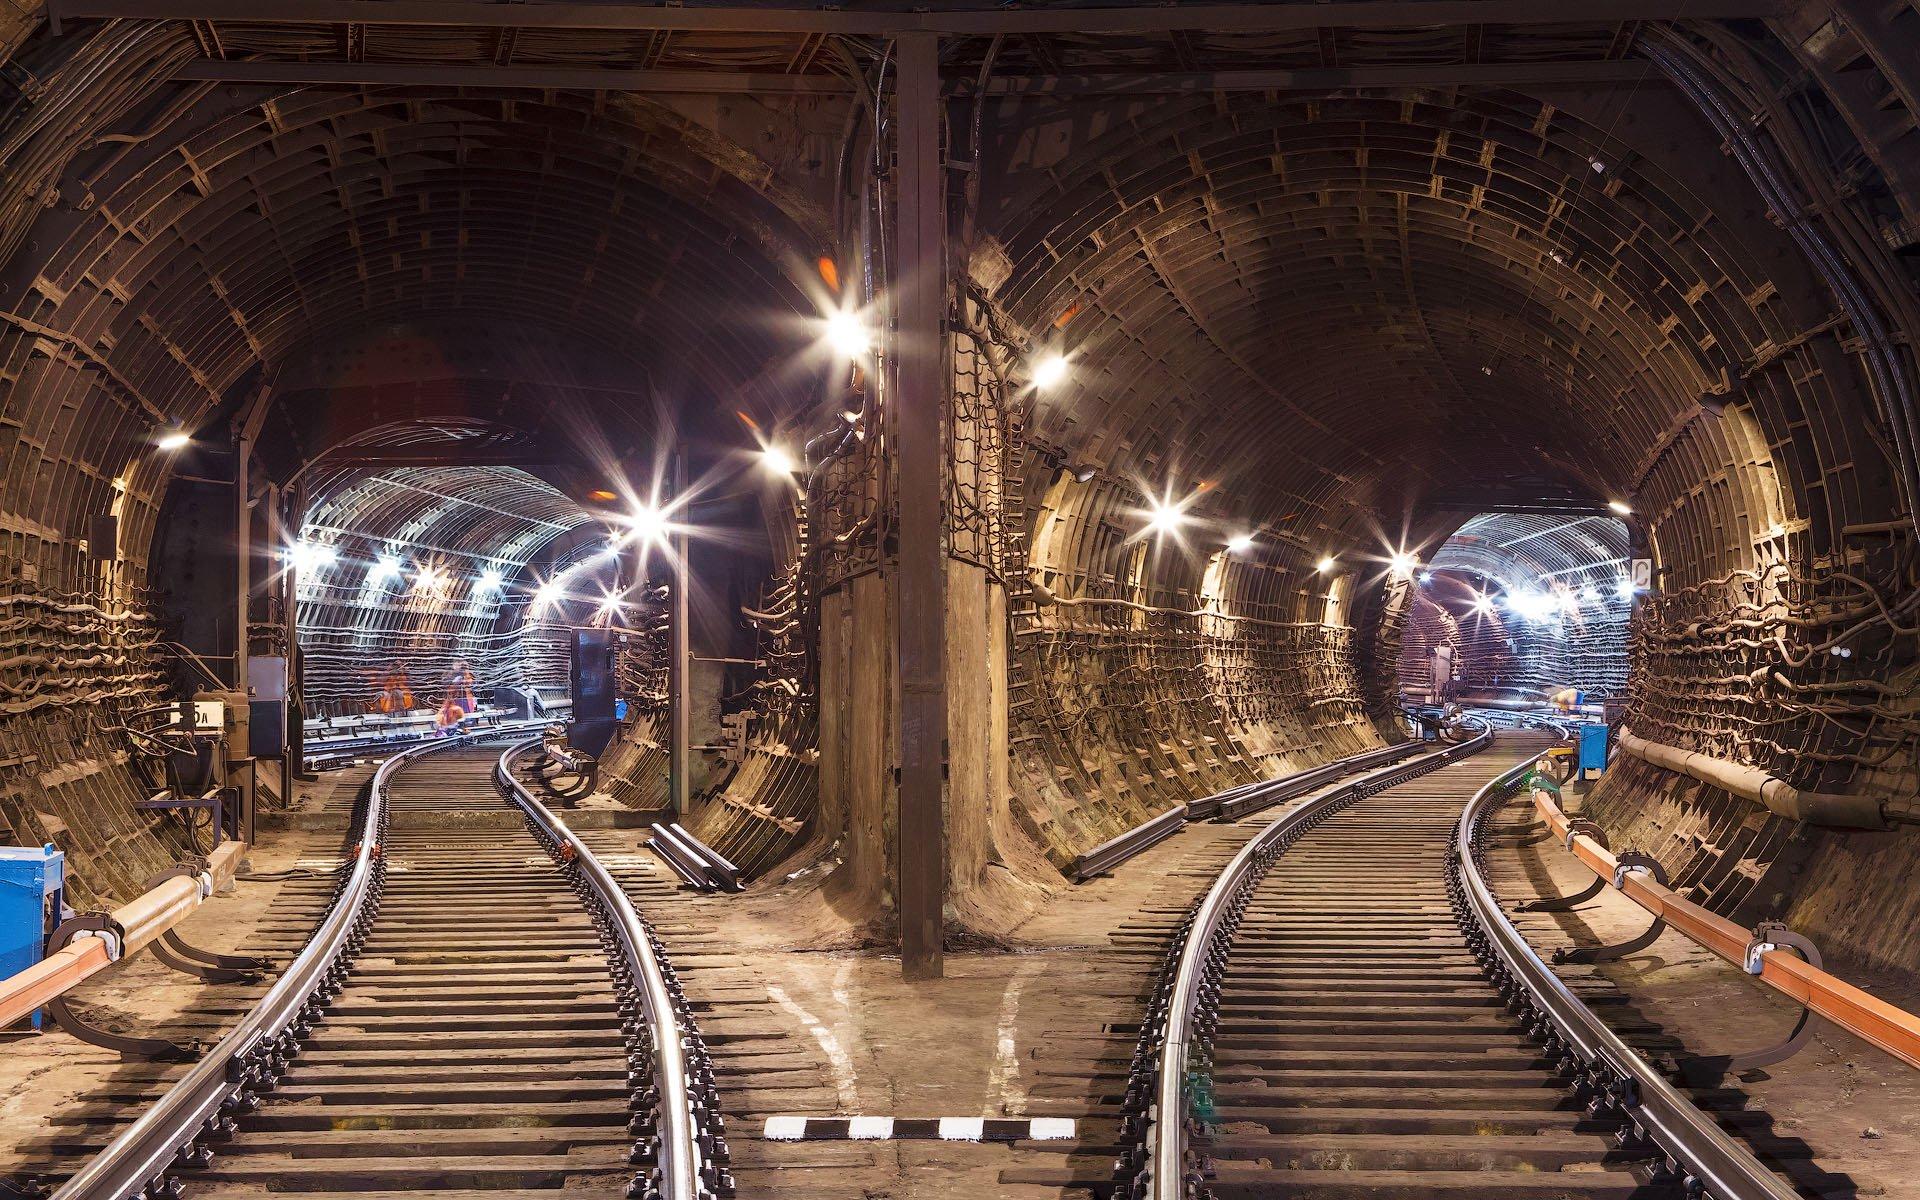 также фото туннелей метро москвы тема